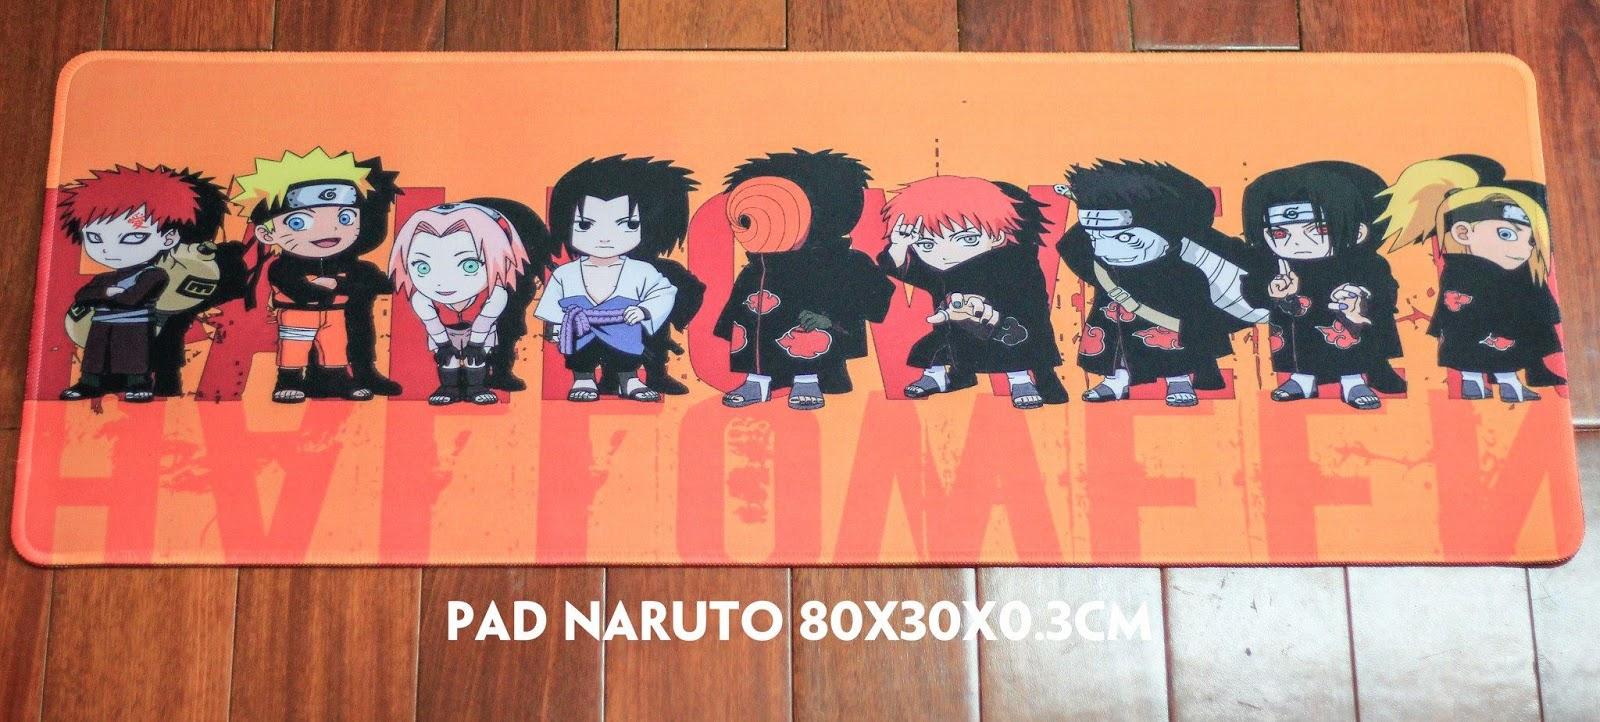 Gamming Mousepad: One piece, CS, CF, LMHT, Doraemon, Naruto, Dota2!!! - 14